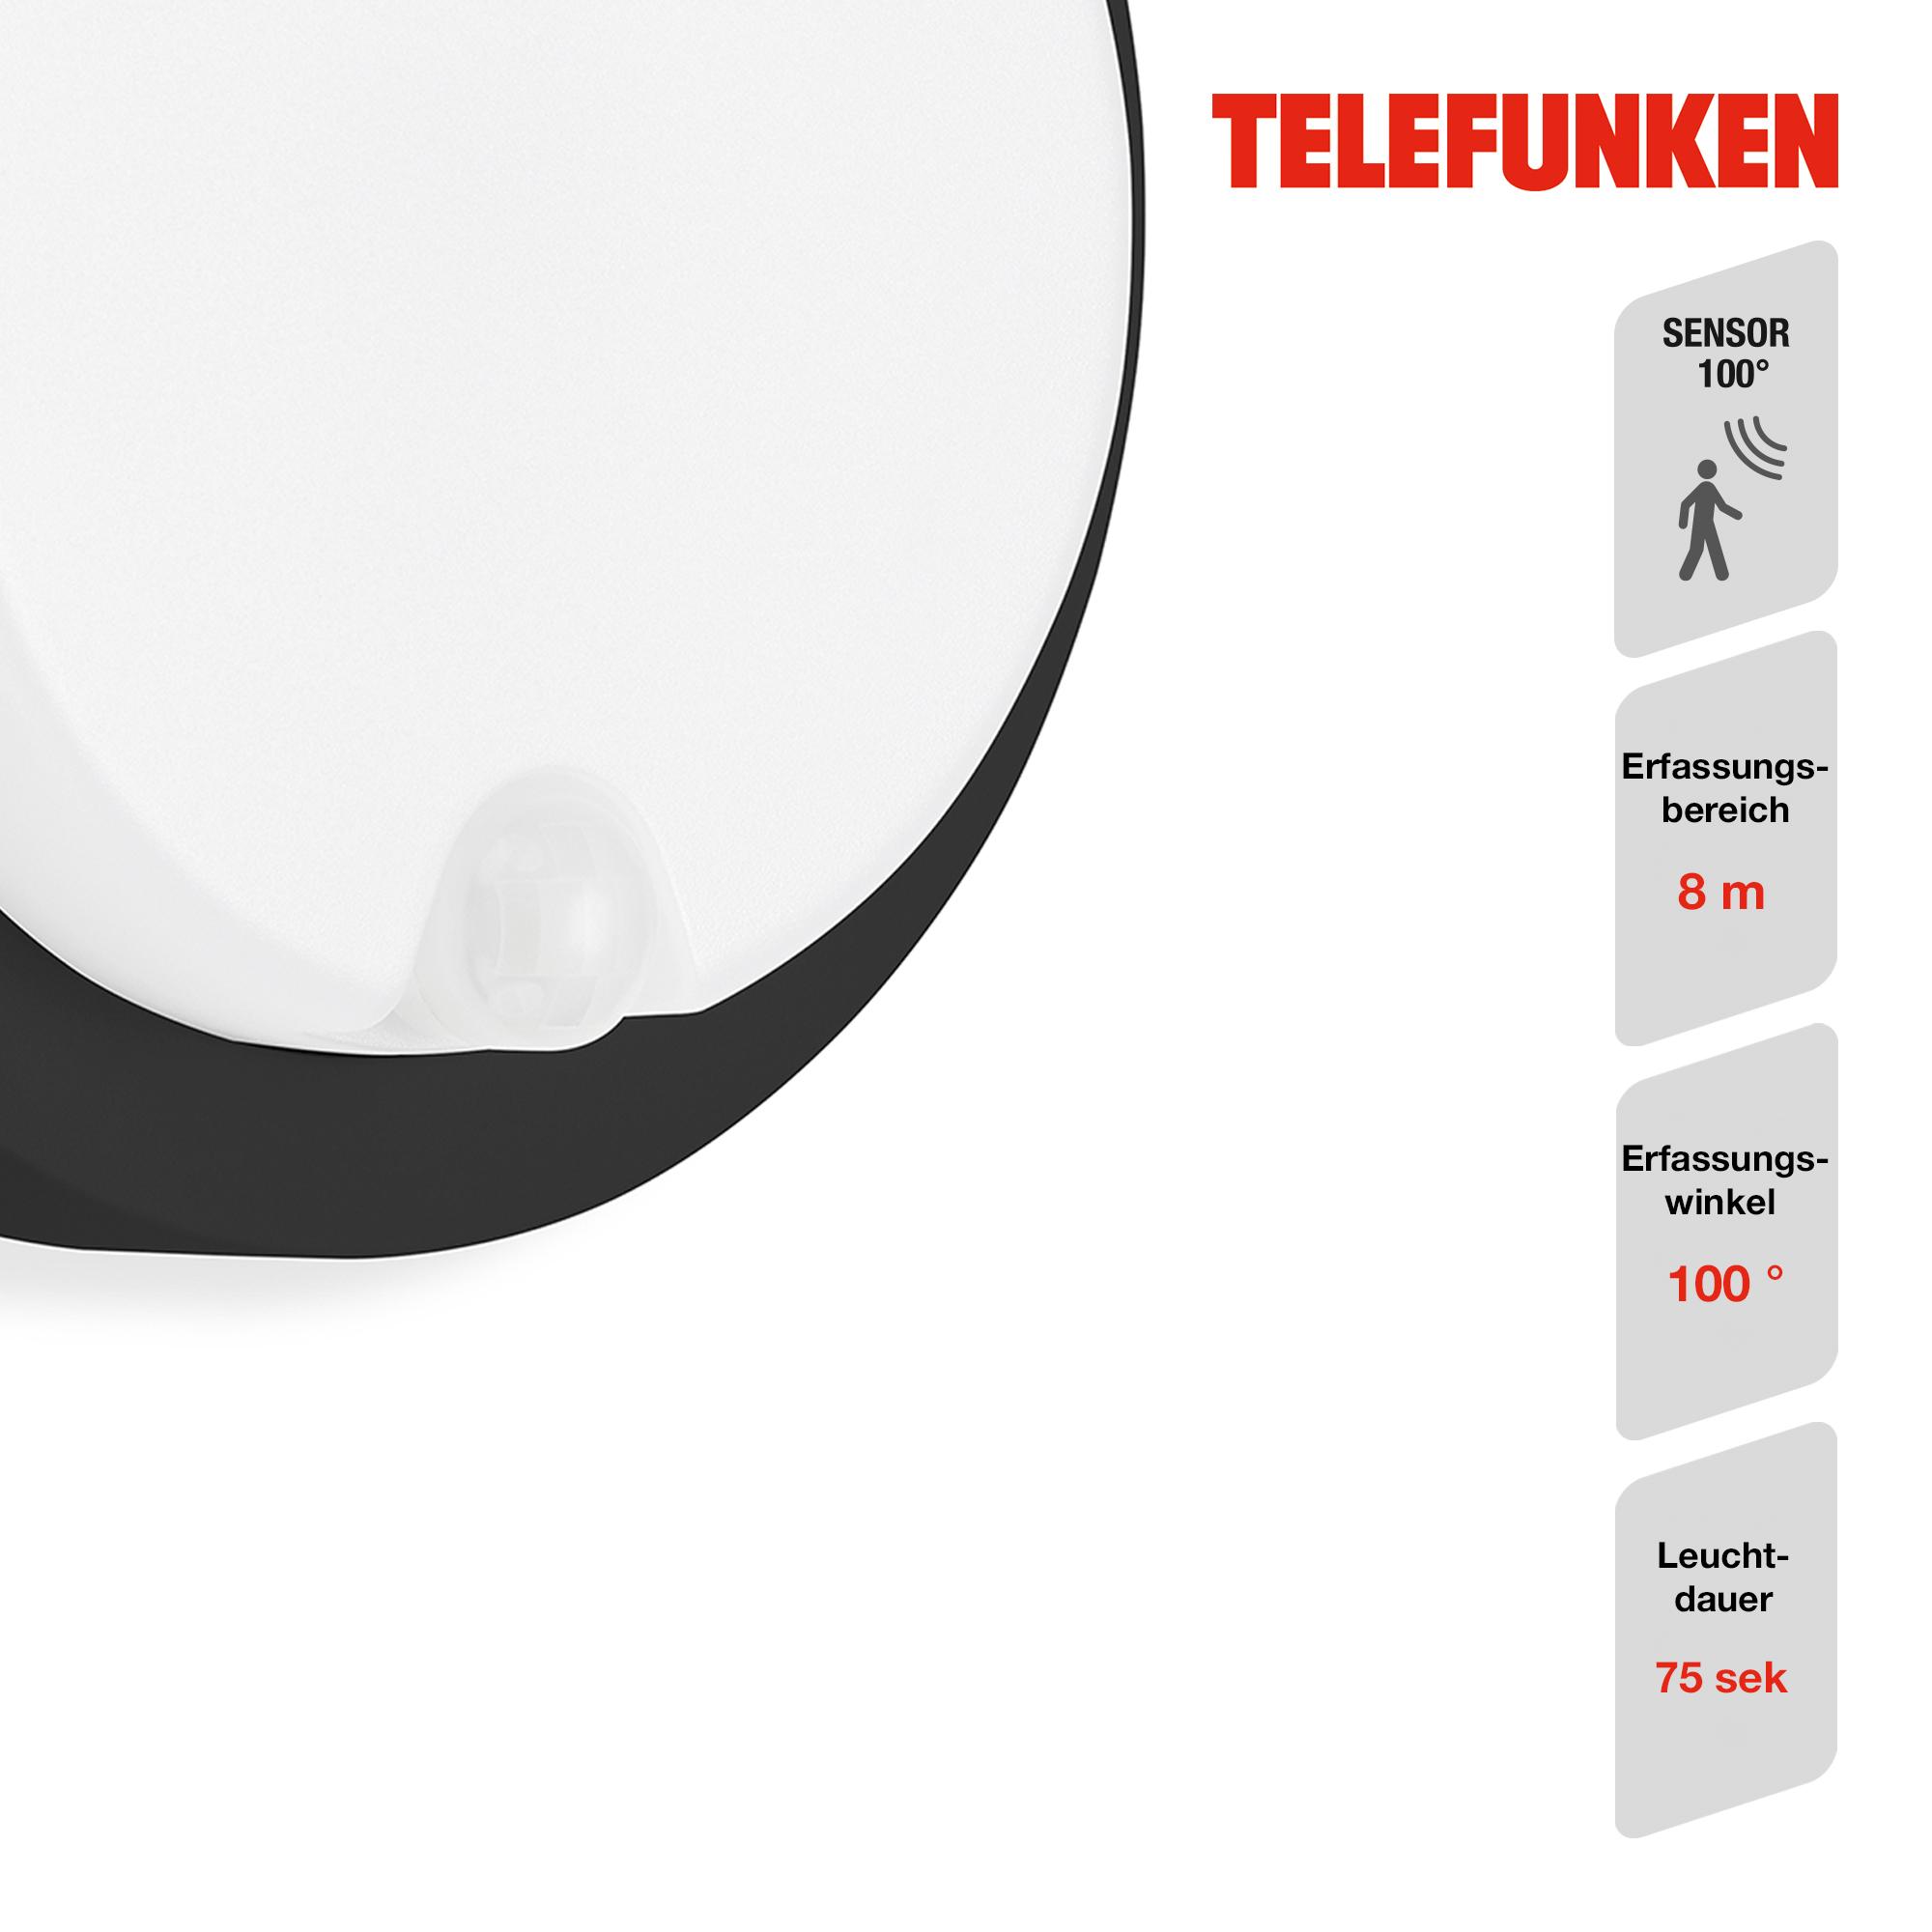 TELEFUNKEN LED Sensor Außenwandleuchte Schwarz